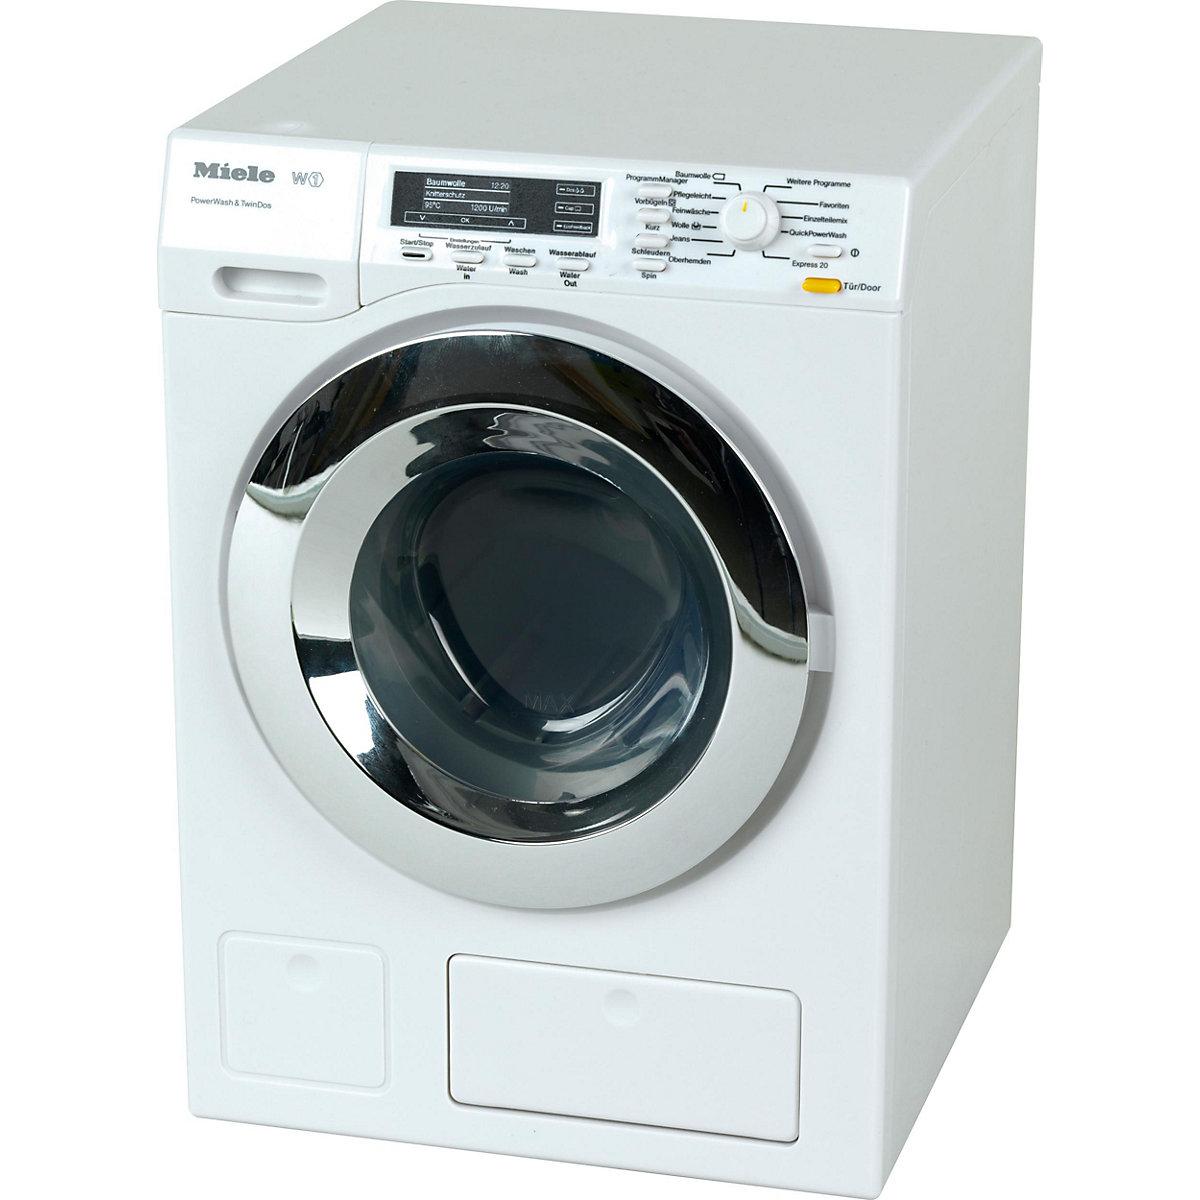 klein miele waschmaschine haushaltsger t klein mytoys. Black Bedroom Furniture Sets. Home Design Ideas